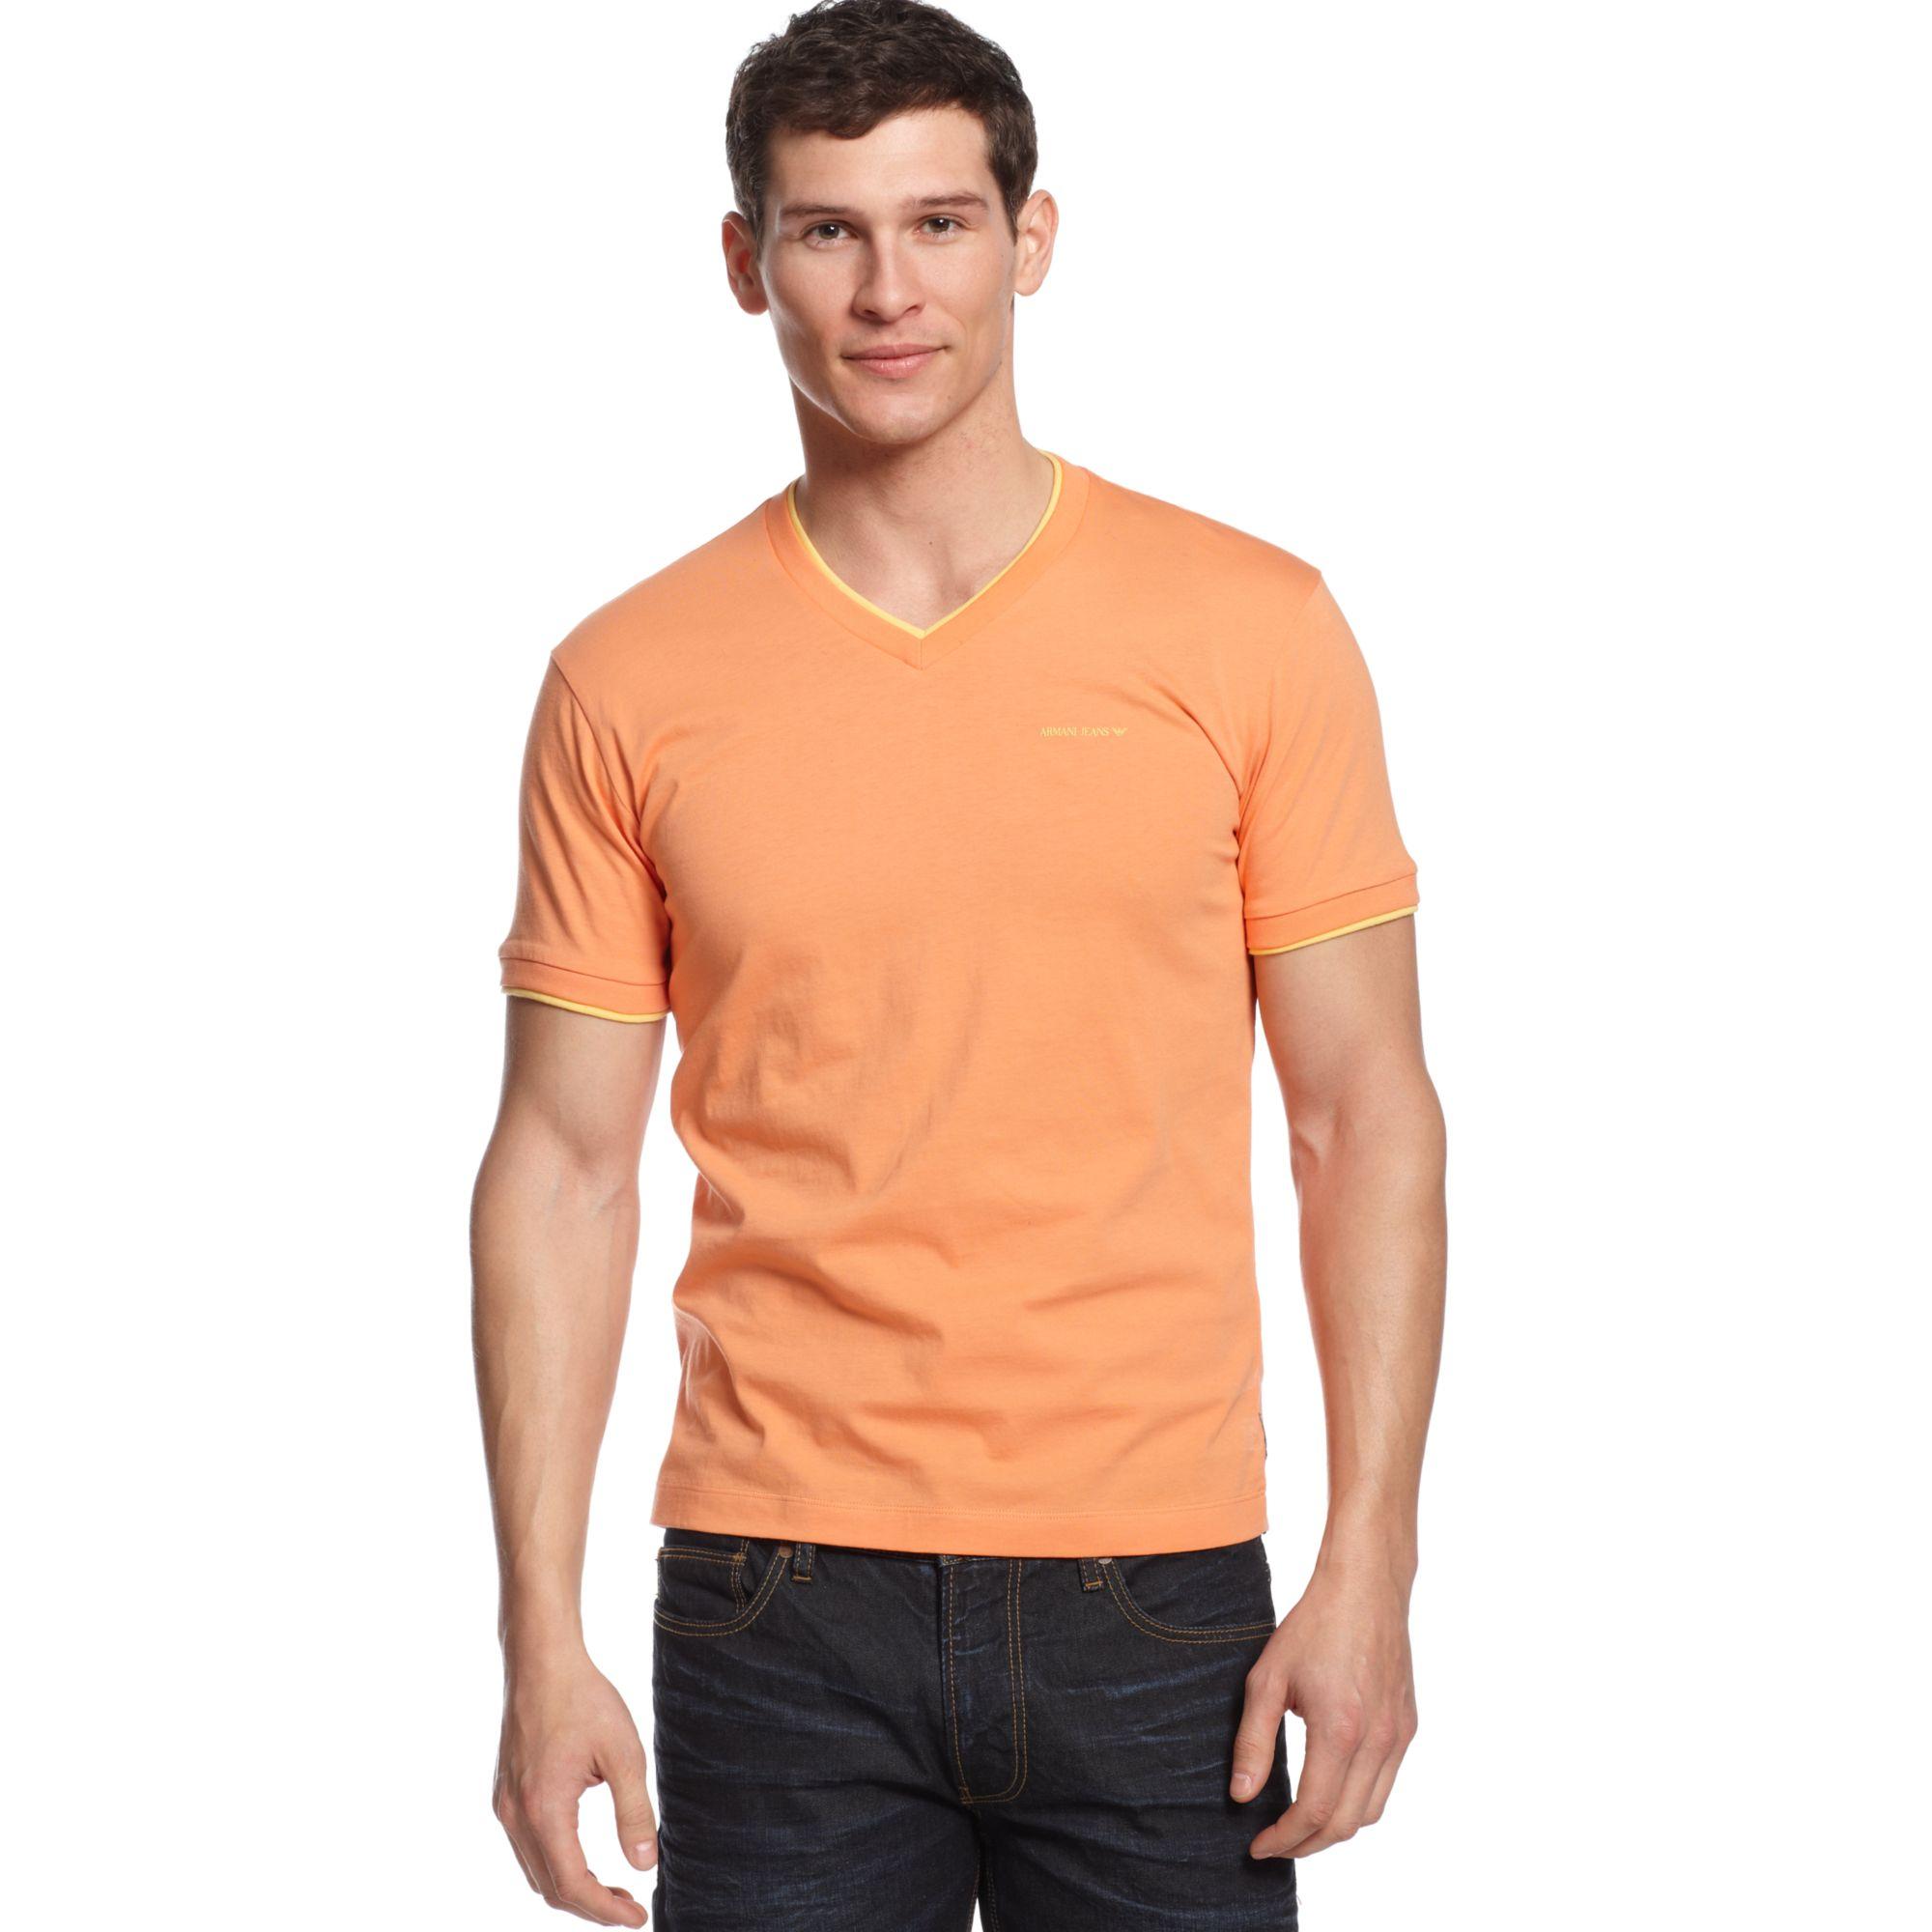 Lyst Armani Jeans Doublelayer Vneck Tshirt In Orange For Men